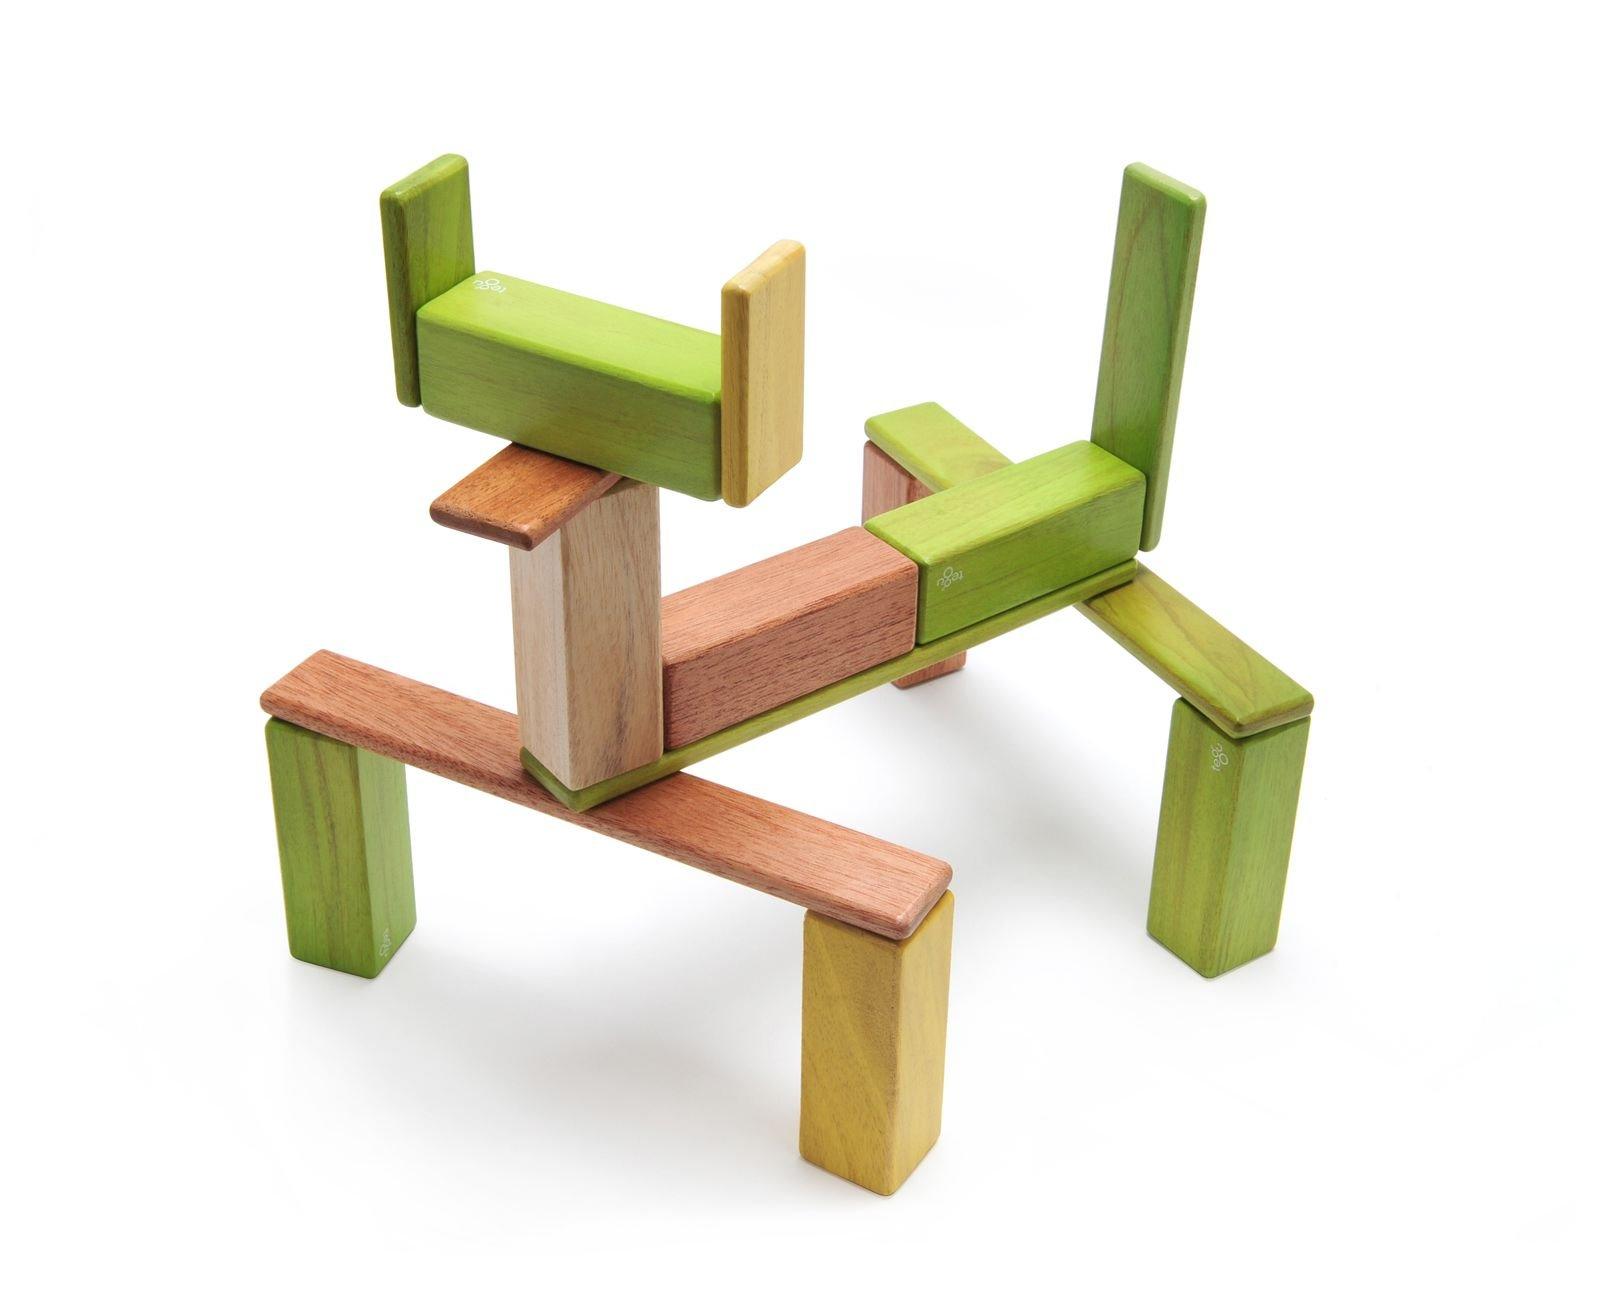 22 Piece Tegu Endeavor Magnetic Wooden Block Set, Jungle by Tegu (Image #3)